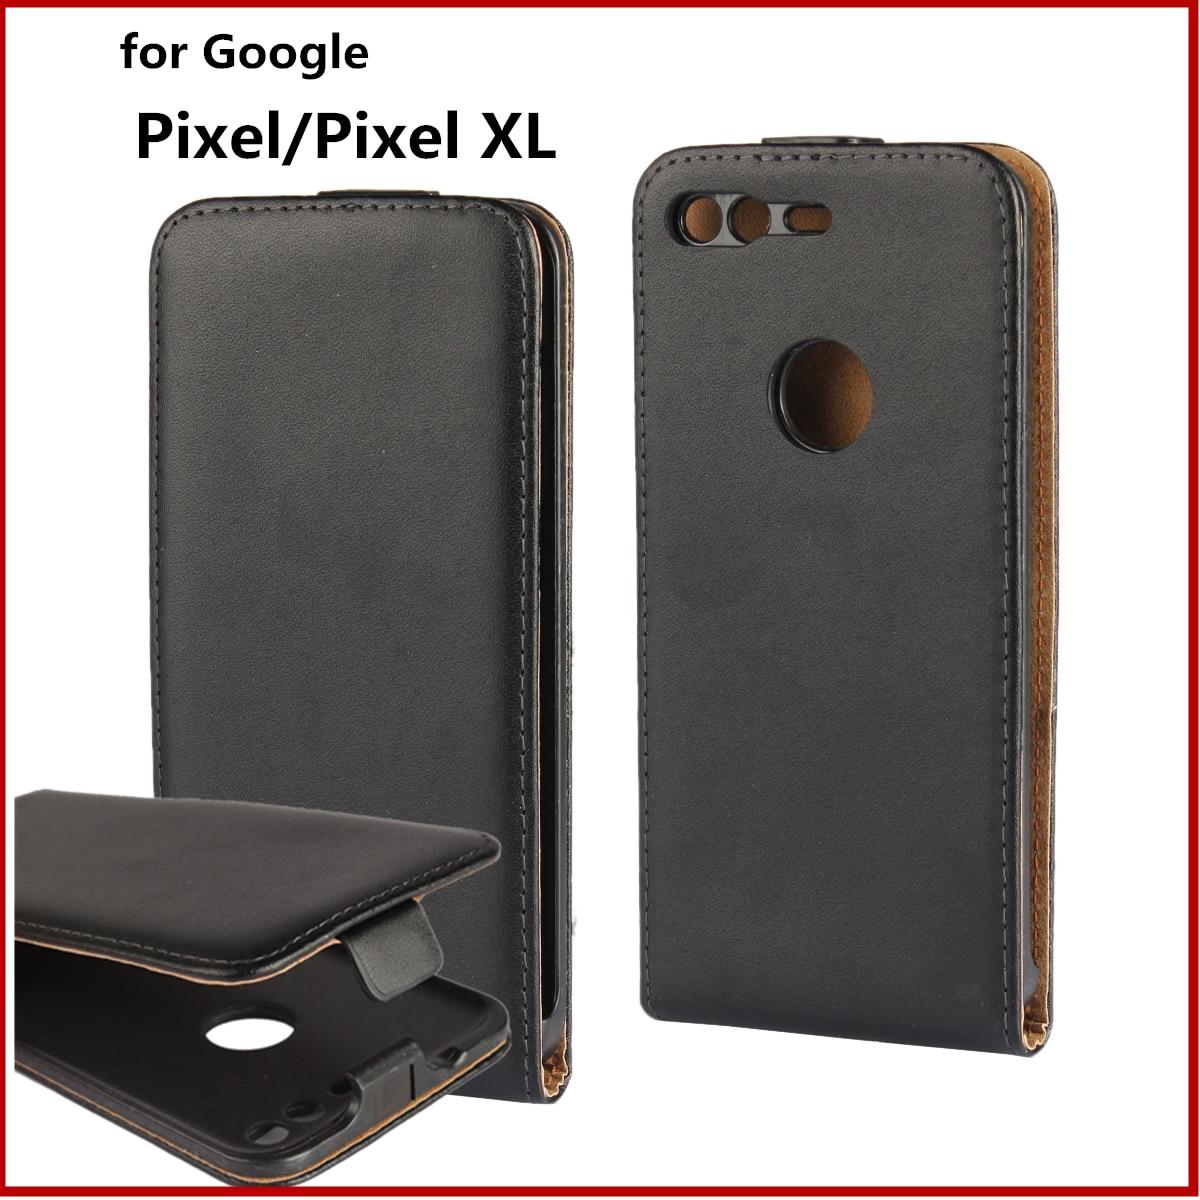 Clamshell Phone Case For Google Pixel Pixel XL Flip Case Magnetic Adsorption Buckle Case Simple Business Fundas